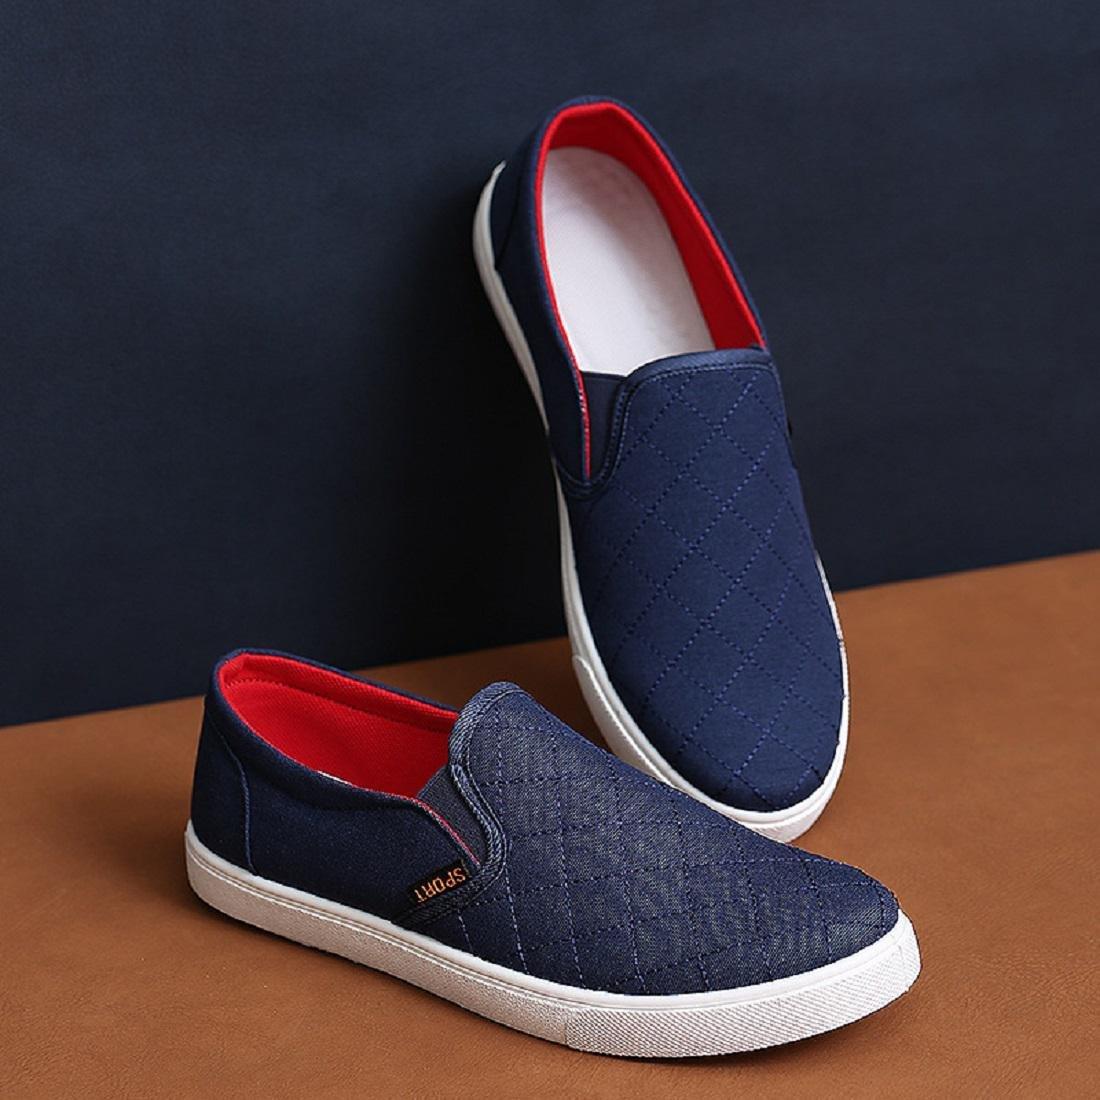 Men's Canvas shoes Leisure shoes Light Comfortable Home Casual shoes Flat  shoes EUR SIZE 39-44: Amazon.co.uk: Sports & Outdoors